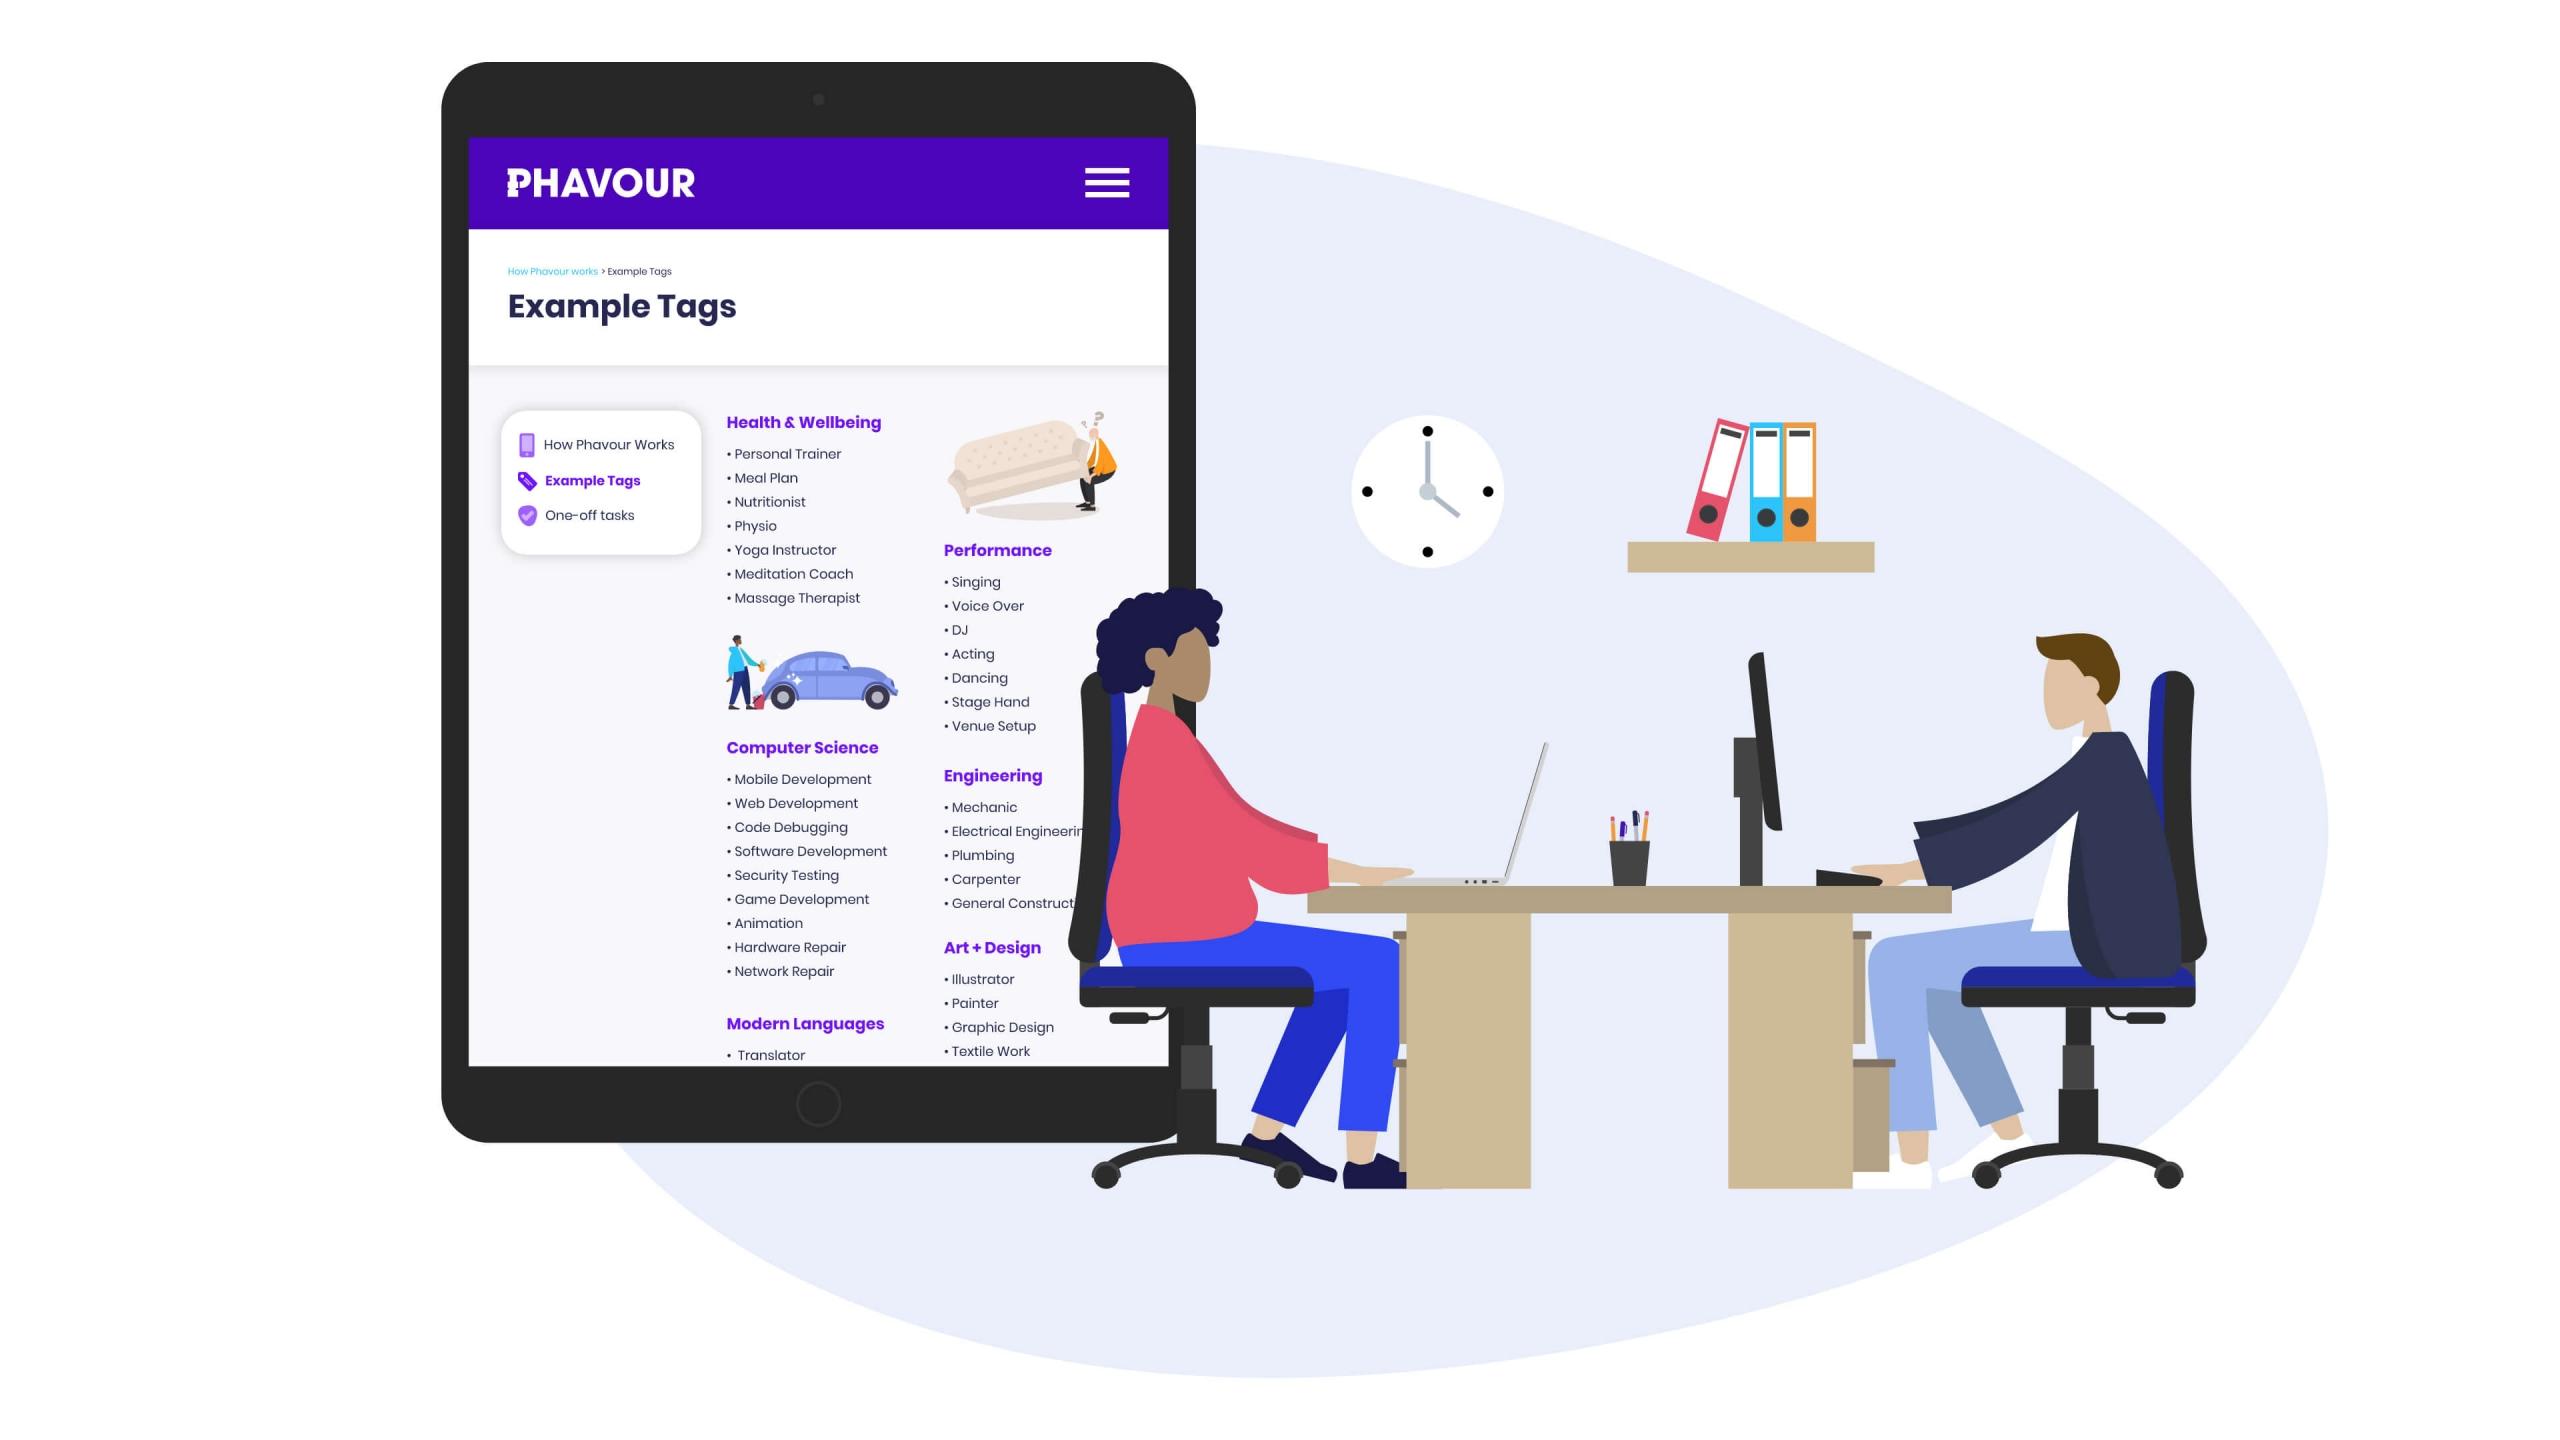 Phavour example tags illustration